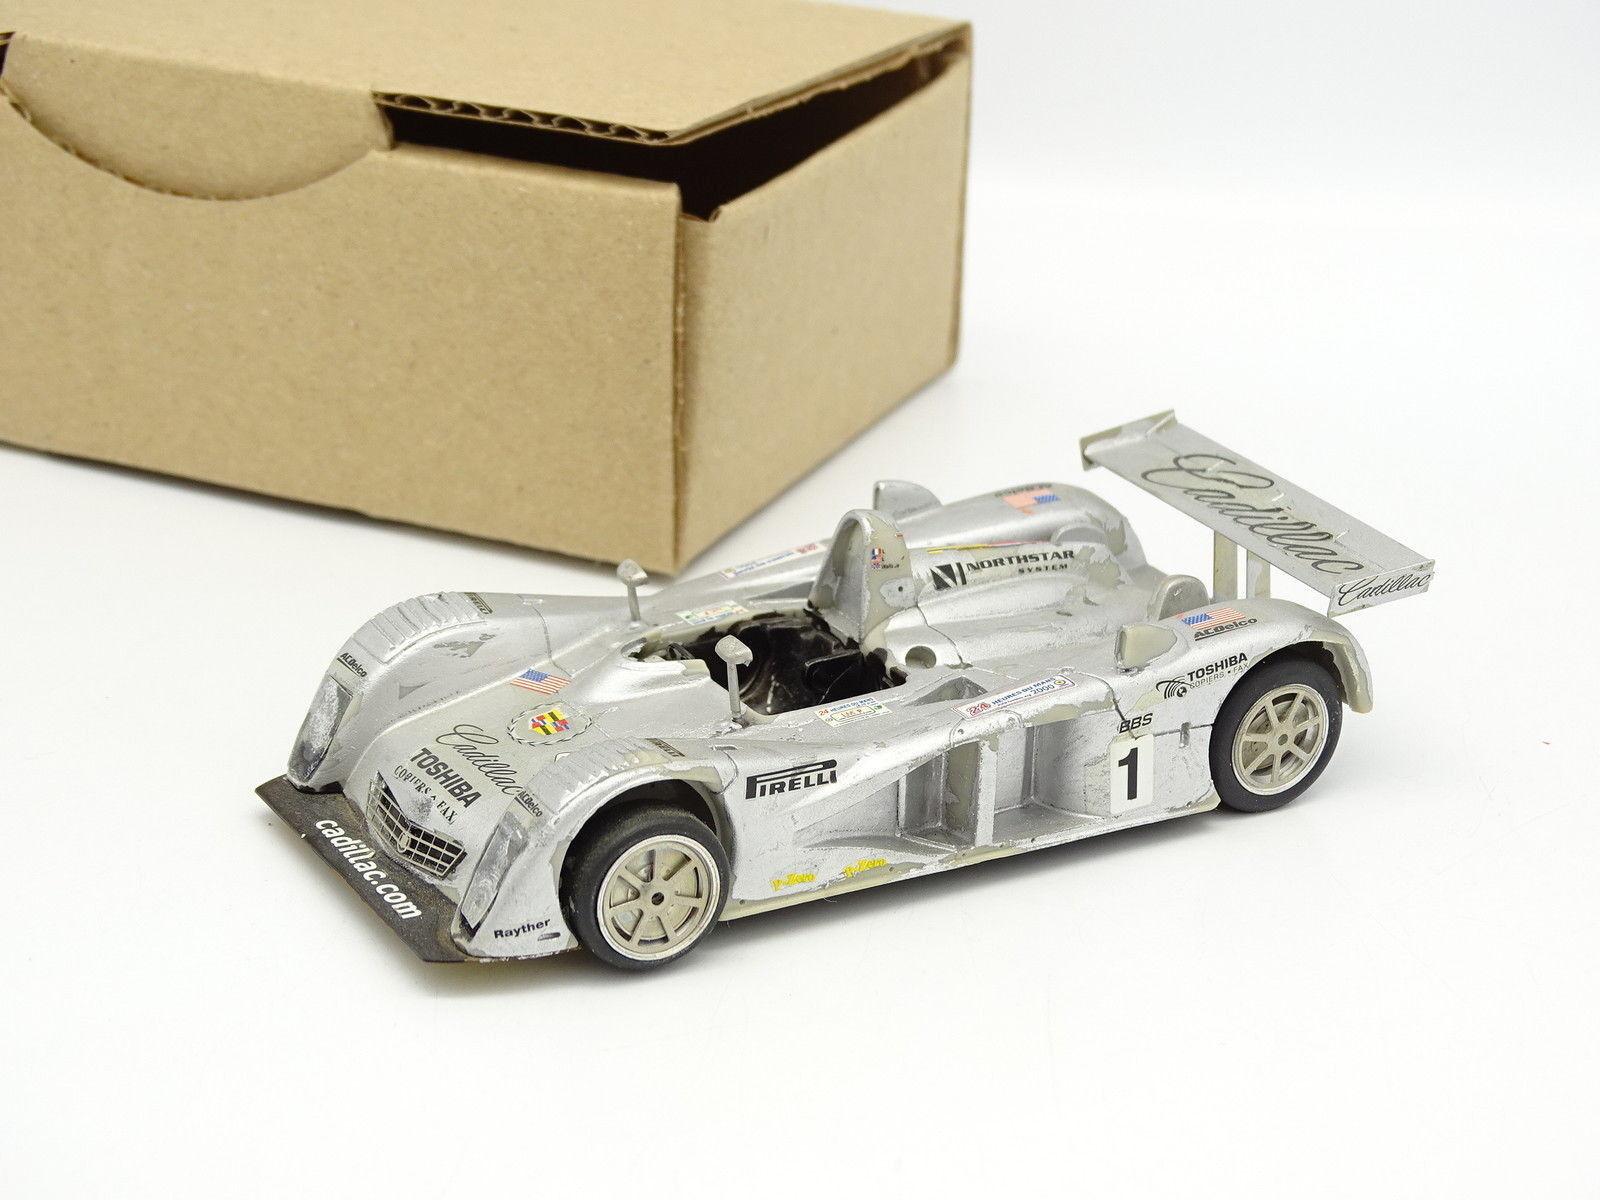 BBR Kit Monté SB 1 43 - Cadillac Northstar LMP N°1 Le Mans 2000